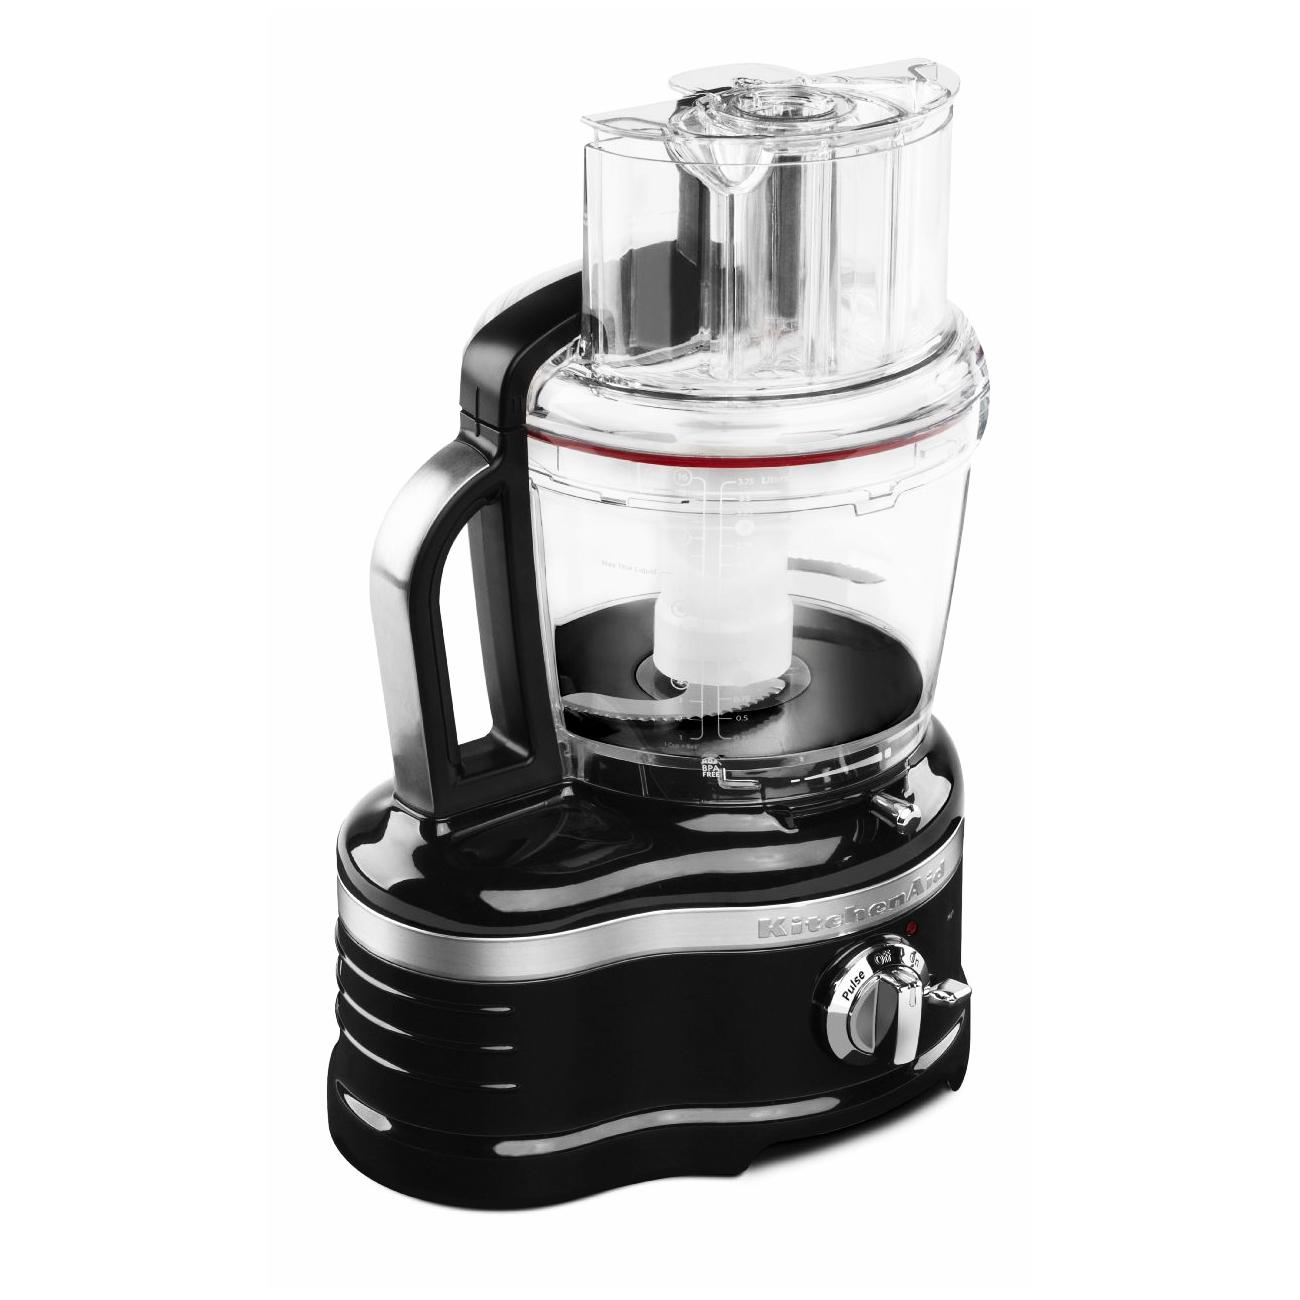 KitchenAid ProLine 16 Cup Onyx Black Food Processor with ExactSlice System